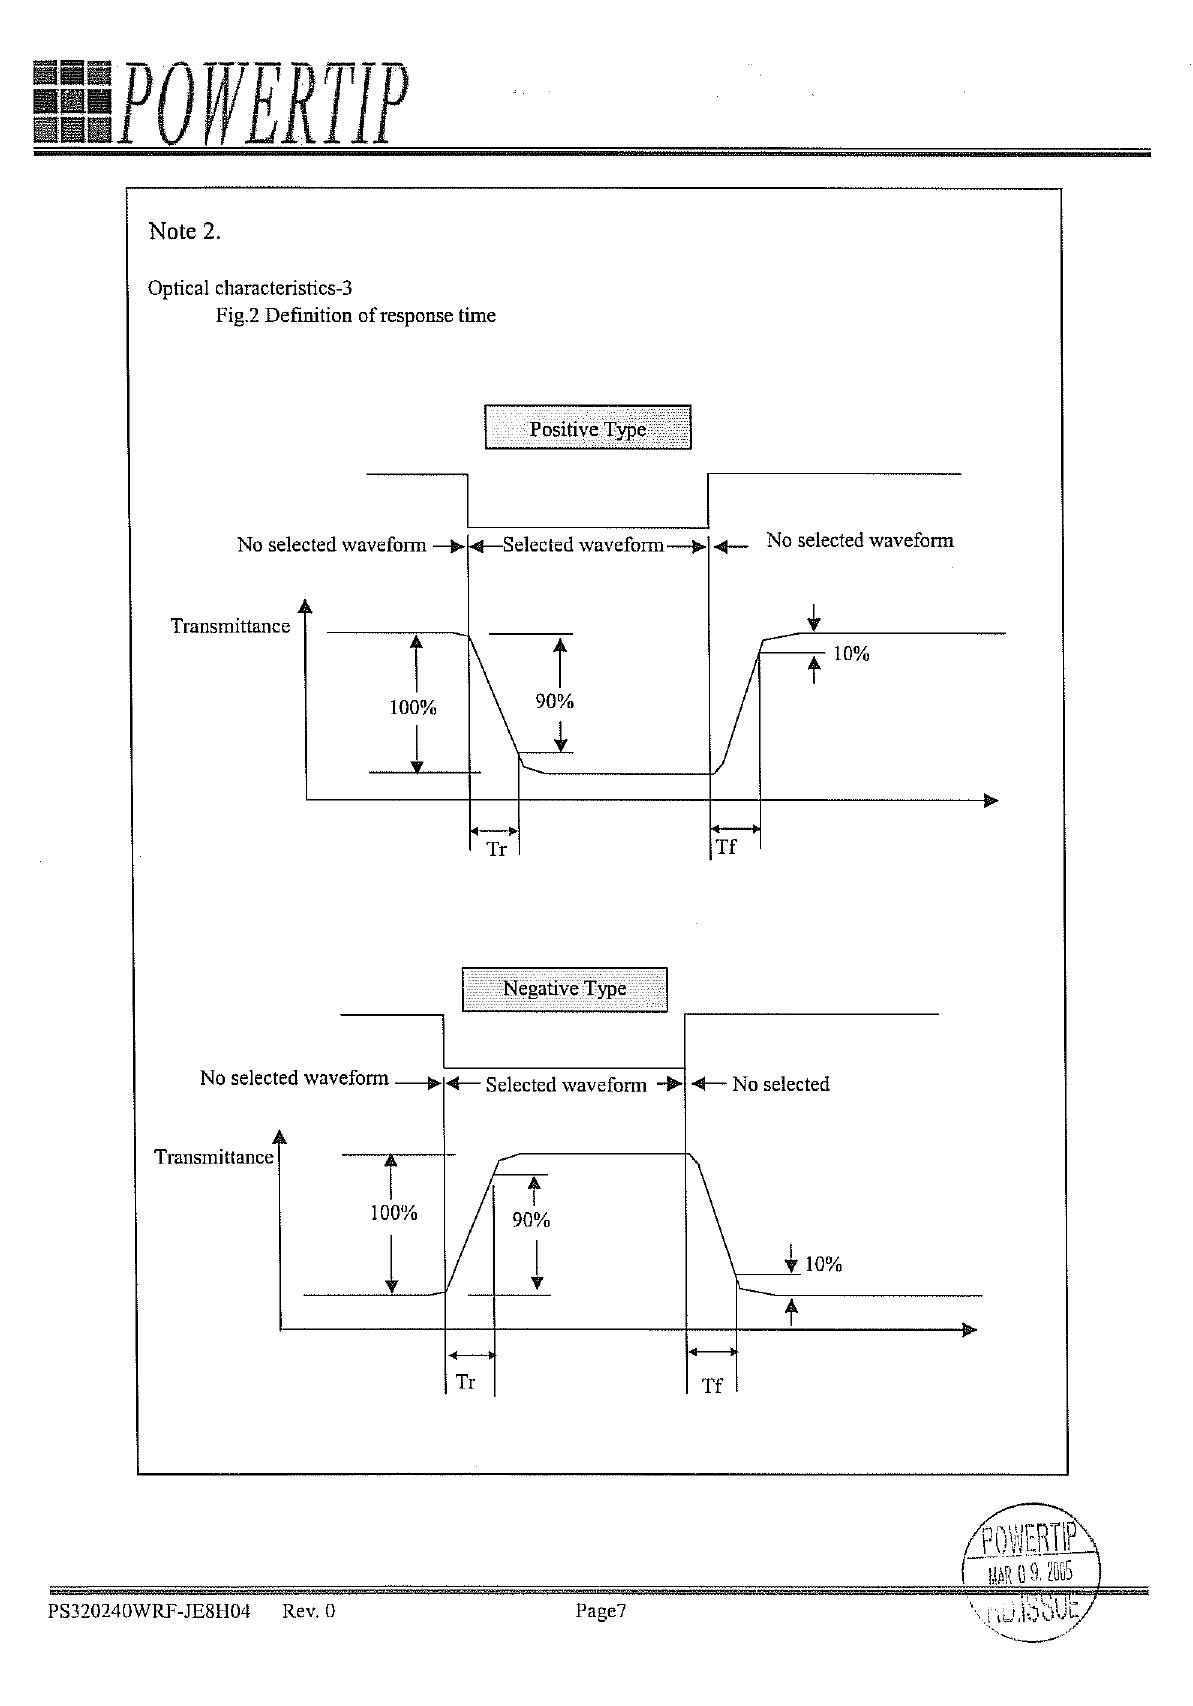 PG320240WRF-JE8HS1 전자부품, 판매, 대치품